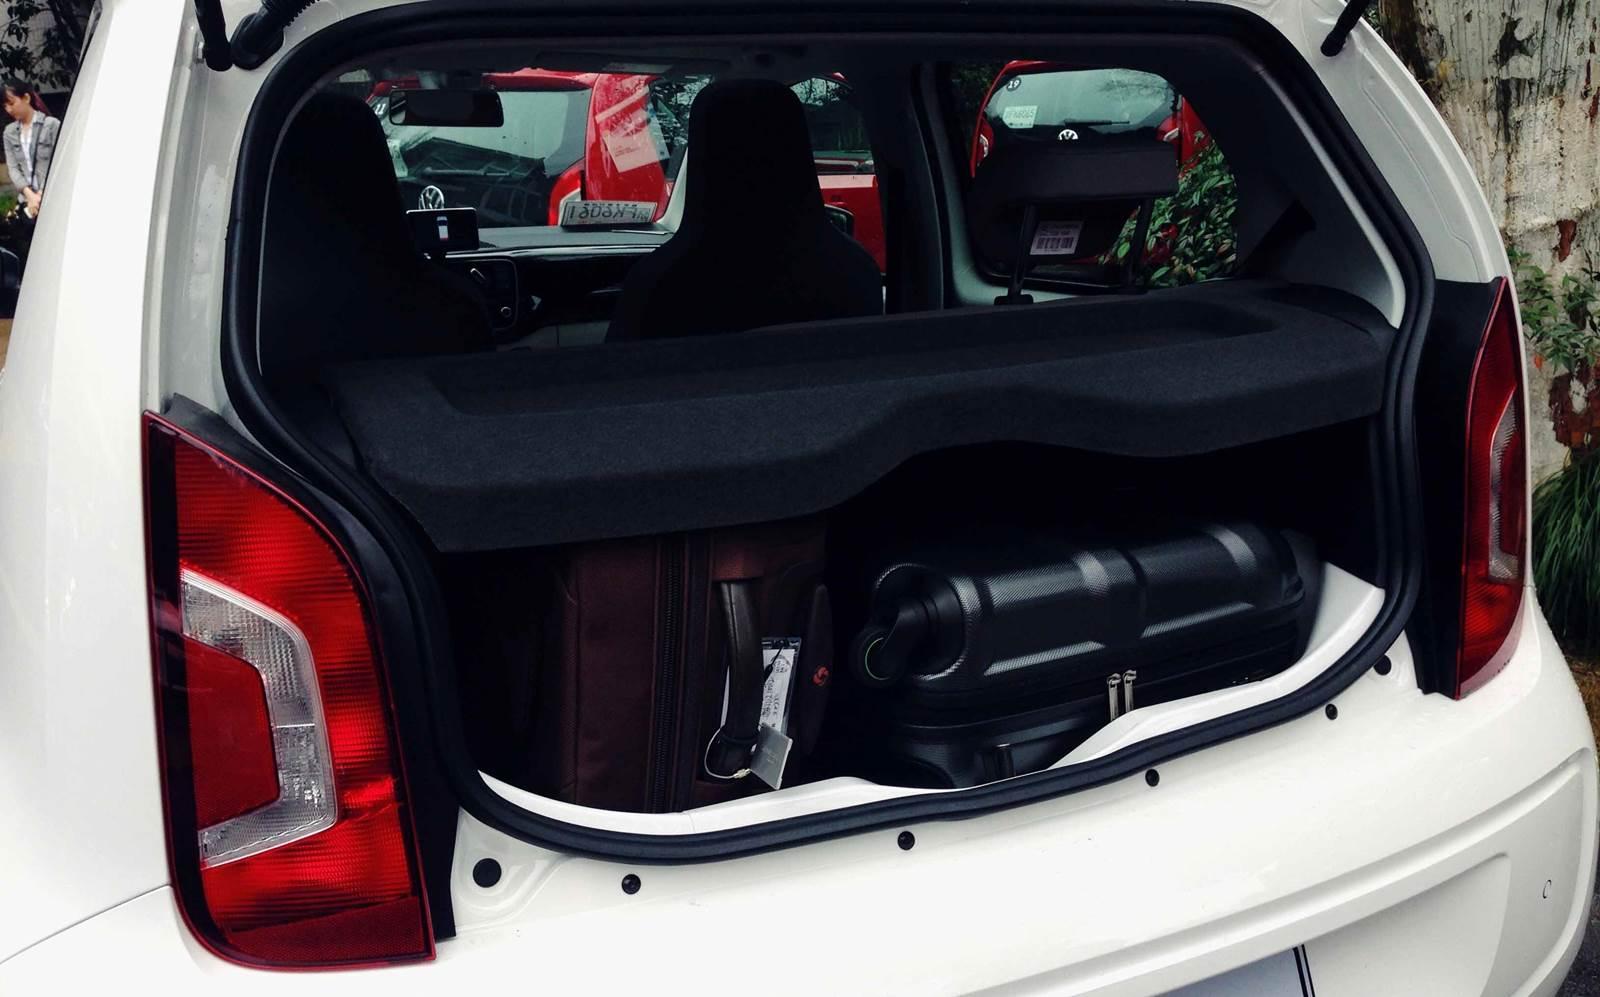 Volkswagen up! - China - interior